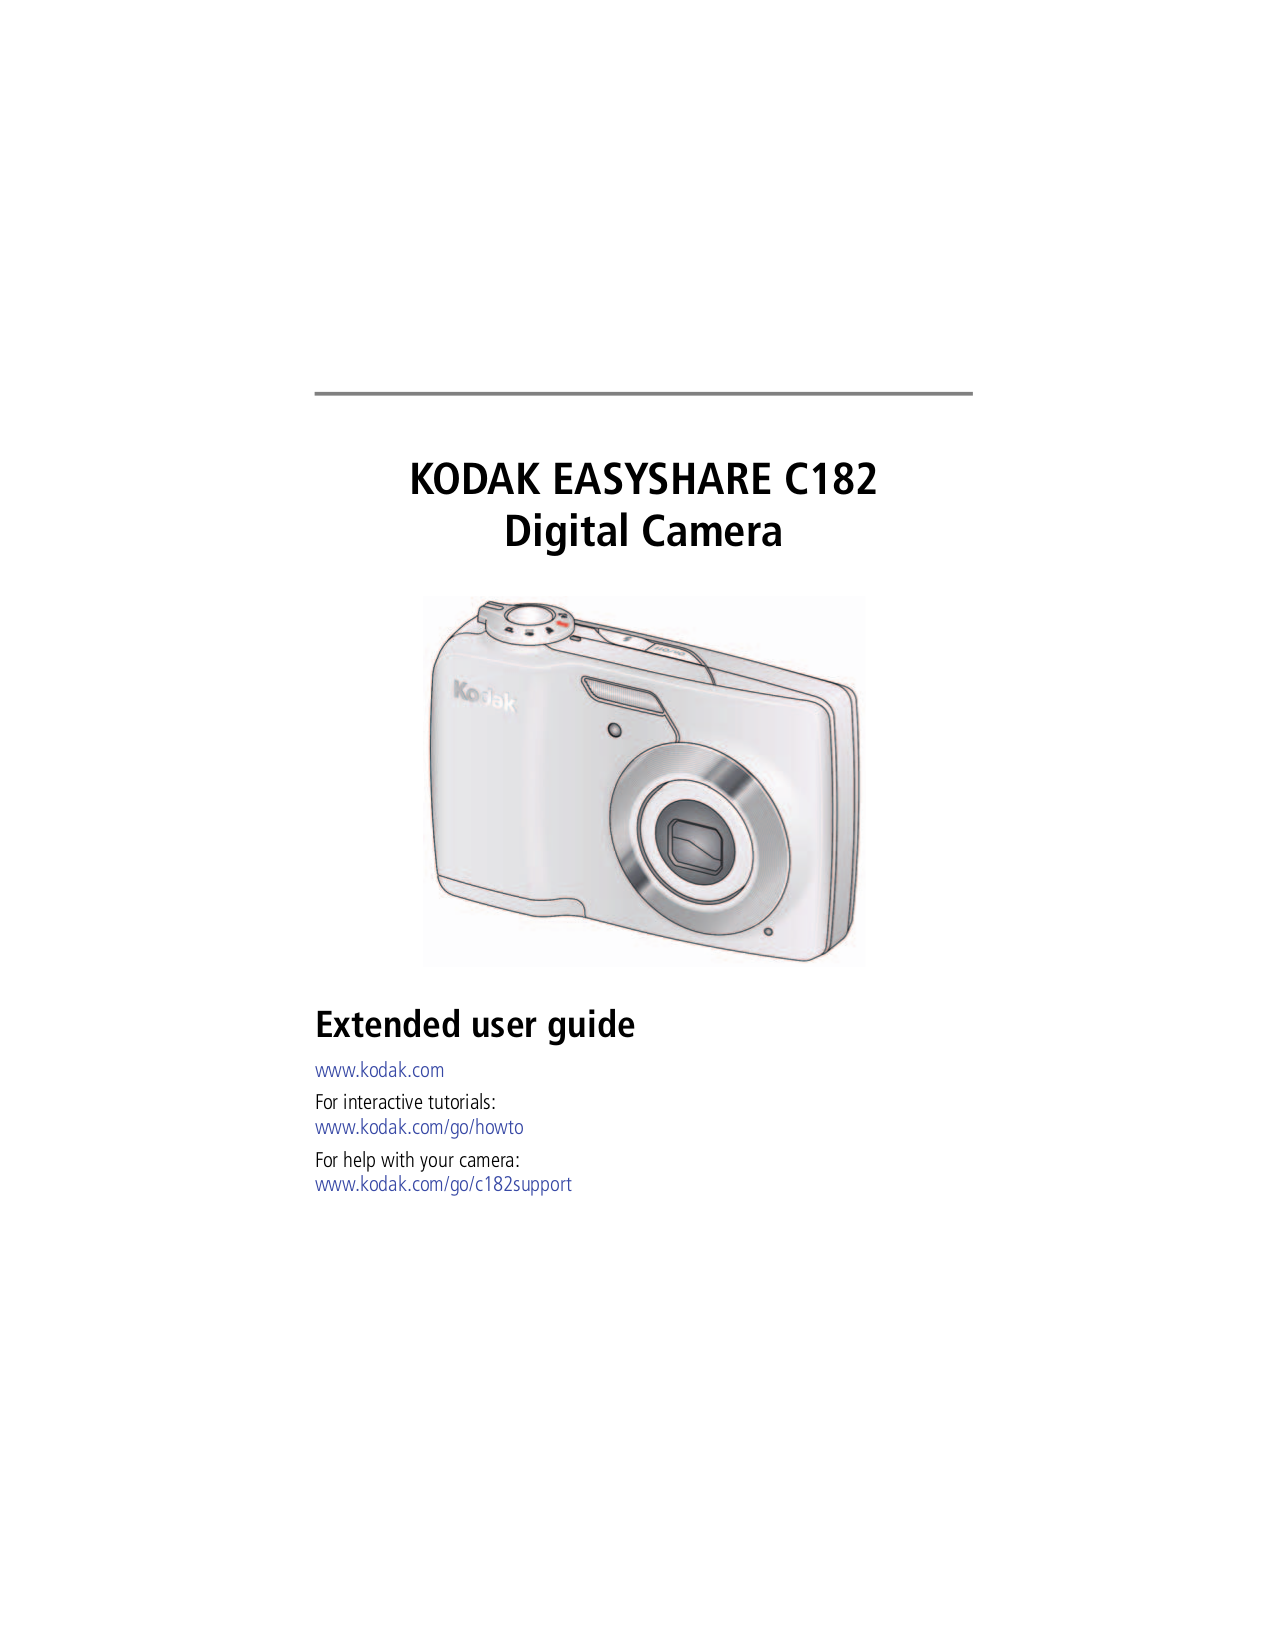 download free pdf for kodak easyshare c182 digital camera manual rh umlib com Kodak EasyShare M340 Pouches Kodak EasyShare V1003